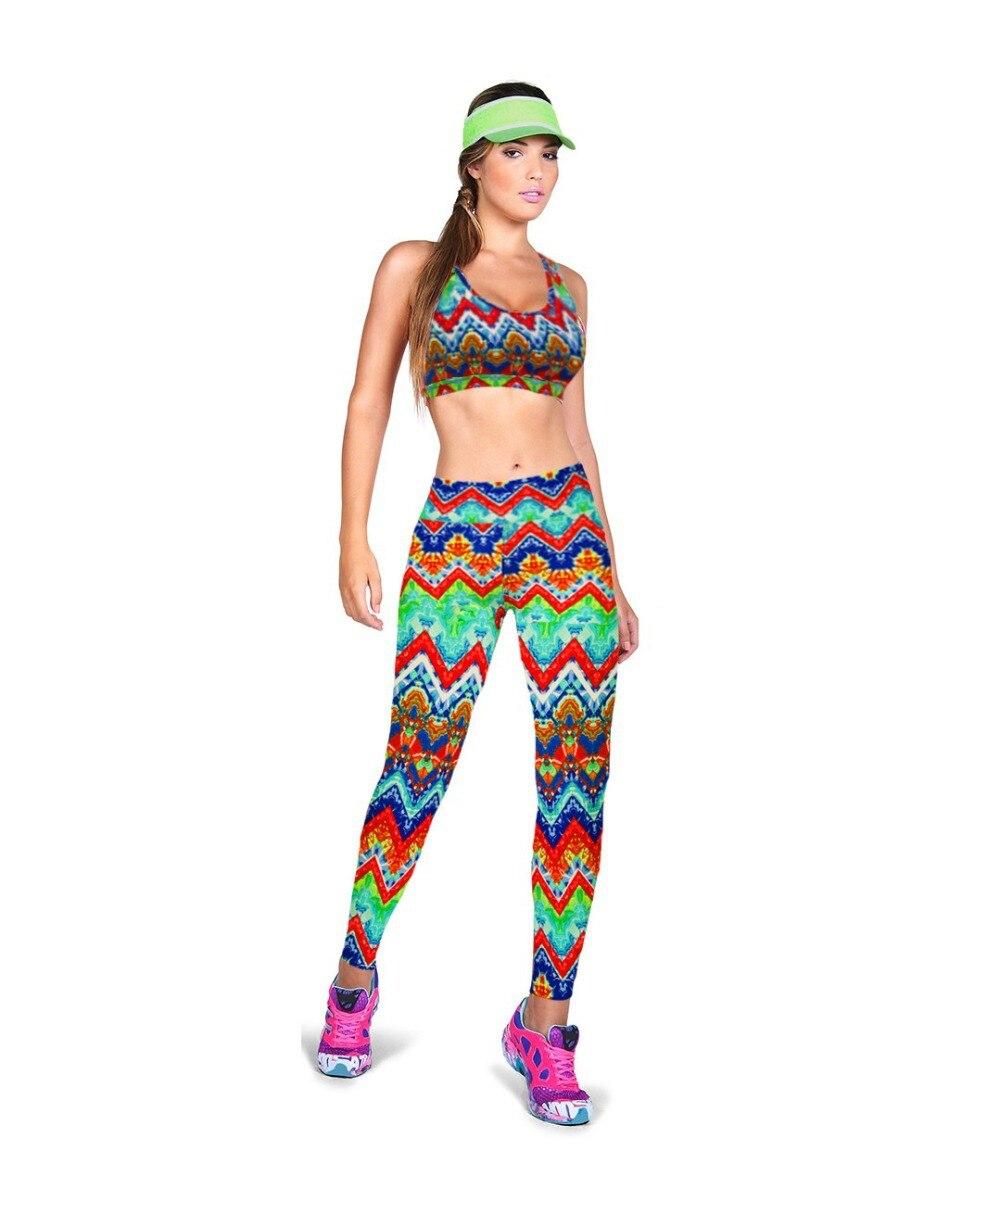 Women s yoga sets sport suit workout clothes female fitness sports - Aliexpress Com Buy Women Yoga Sets Tops Pants Fitness Clothing Sport Suit For Female Women S Gym Pilates Running Lulu Sports Slim Leggings Shirts From